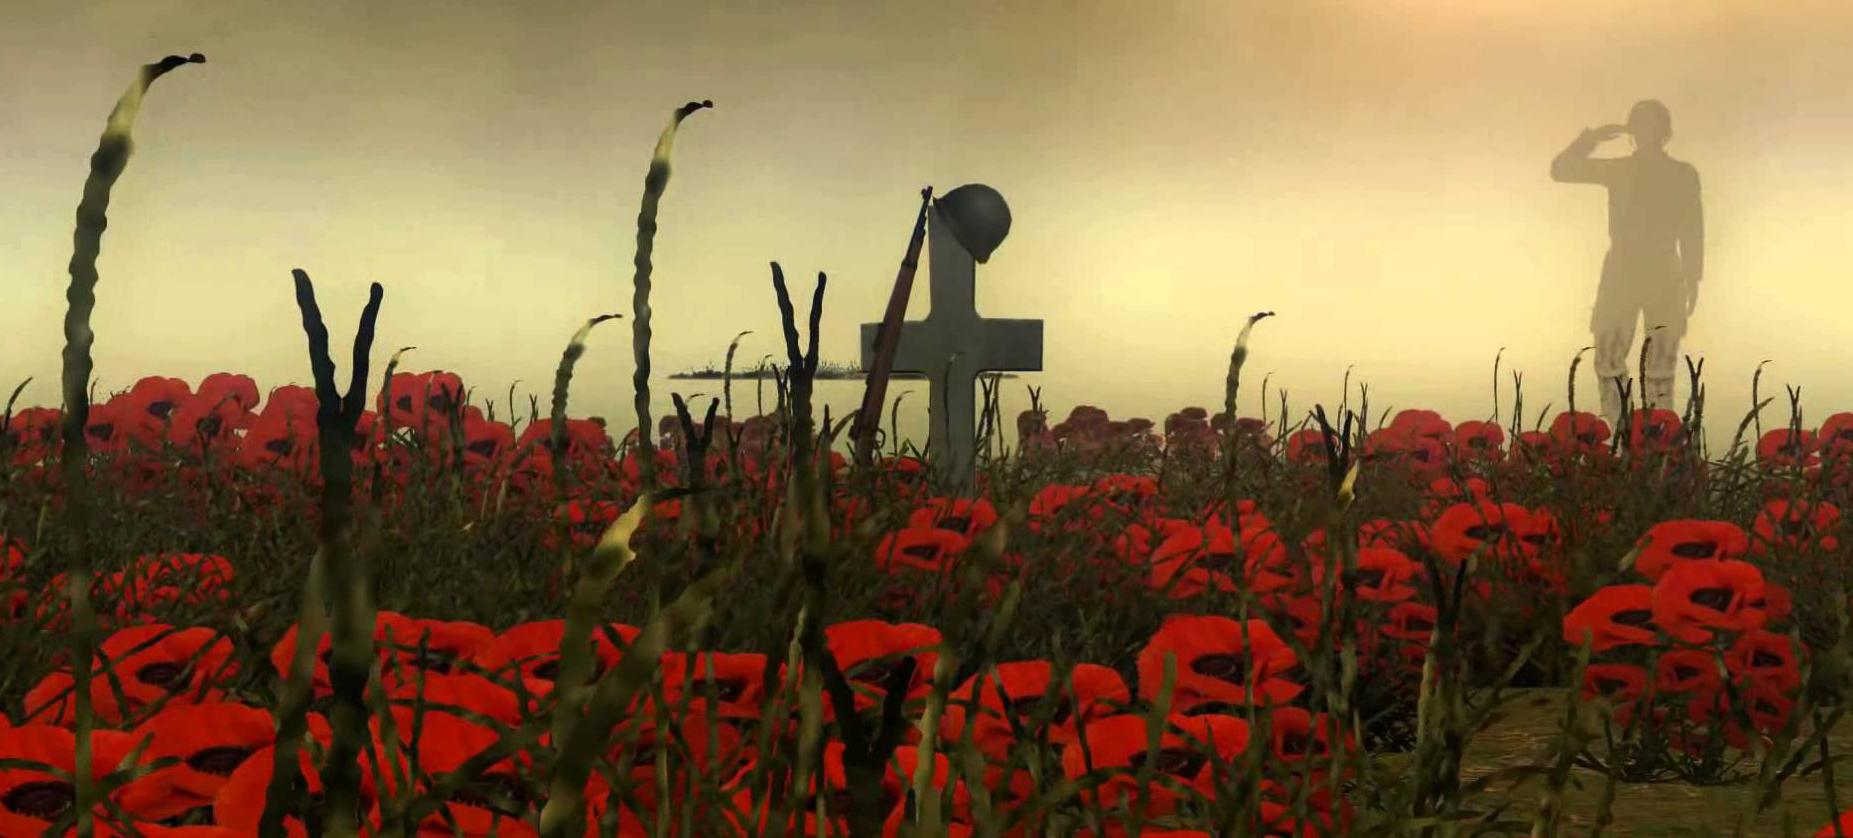 Remembrance Day 2020 in Pelham - Town of Pelham